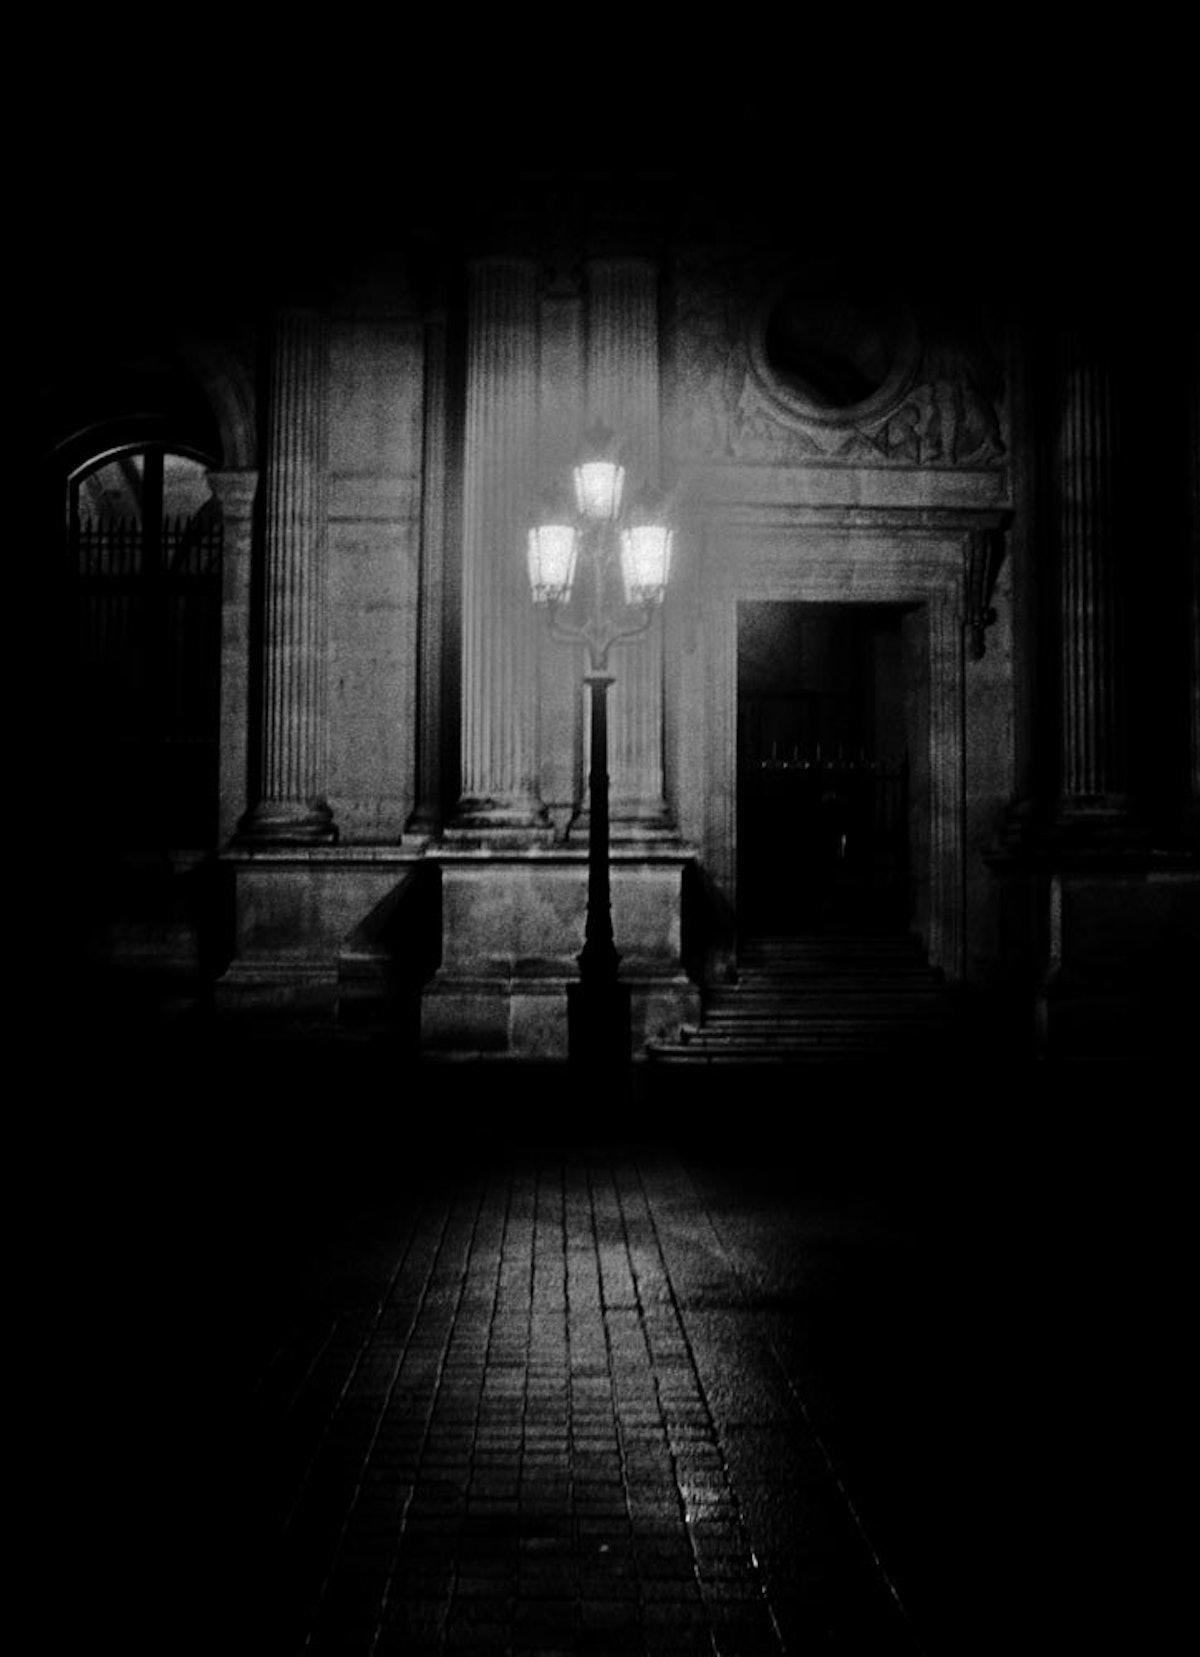 Erik-Madigan-Heck,-Paris-Streetlamps